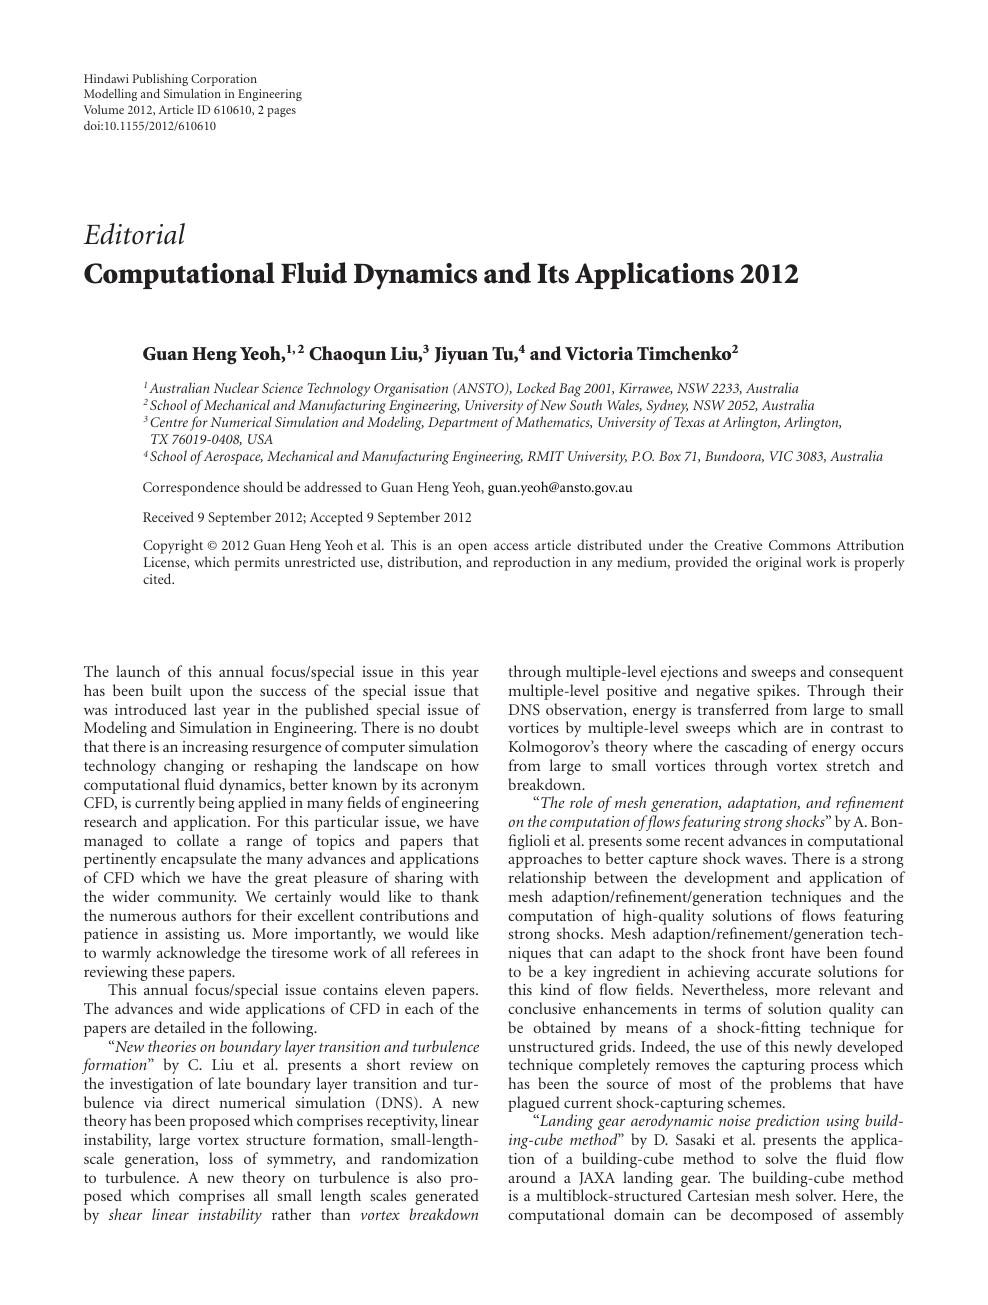 Computational Fluid Dynamics and Its Applications 2012 – topic of